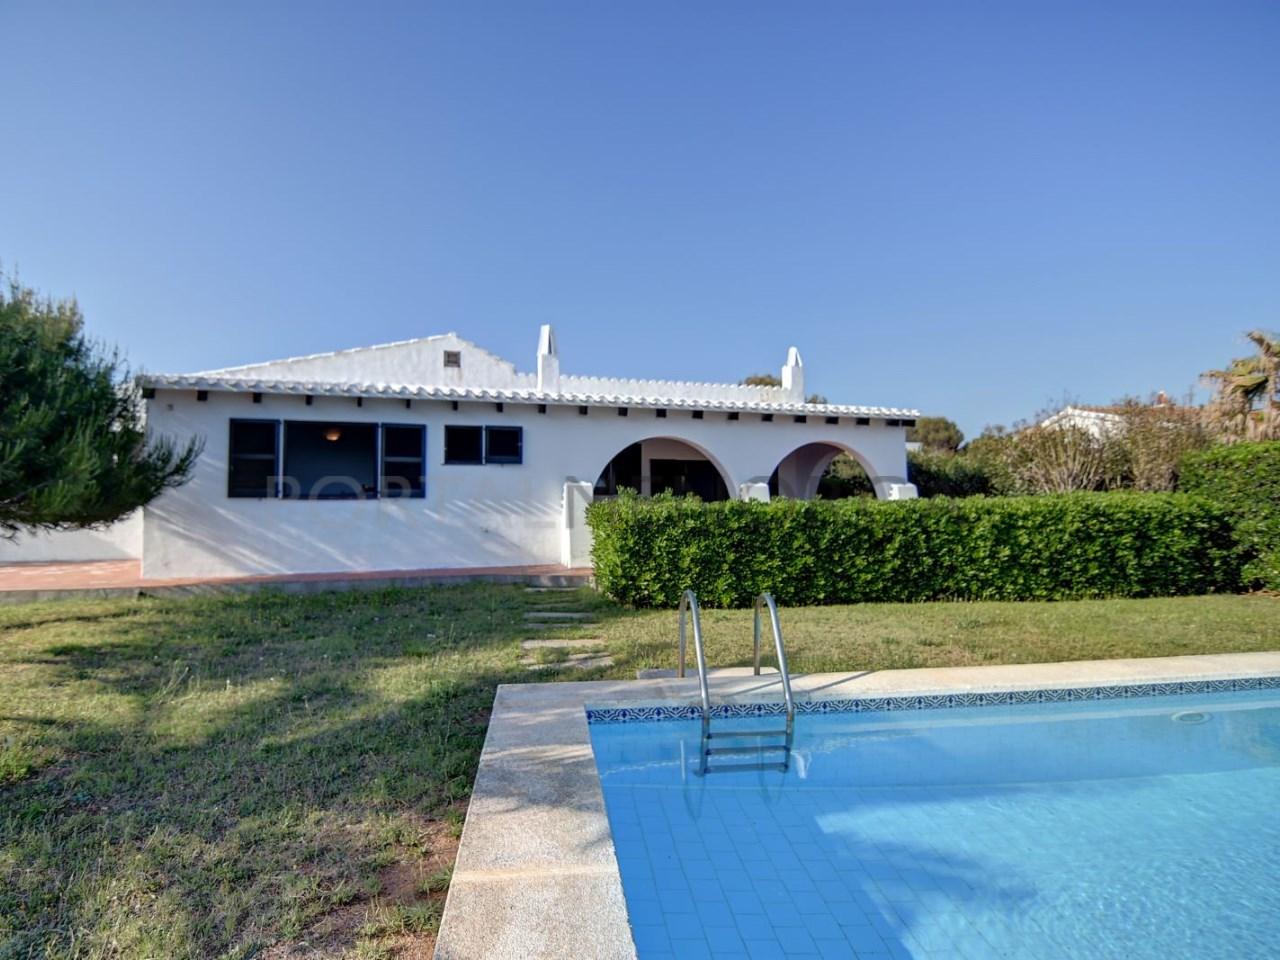 piscina-chalet-binidali-mahon-menorca-H2534(3)